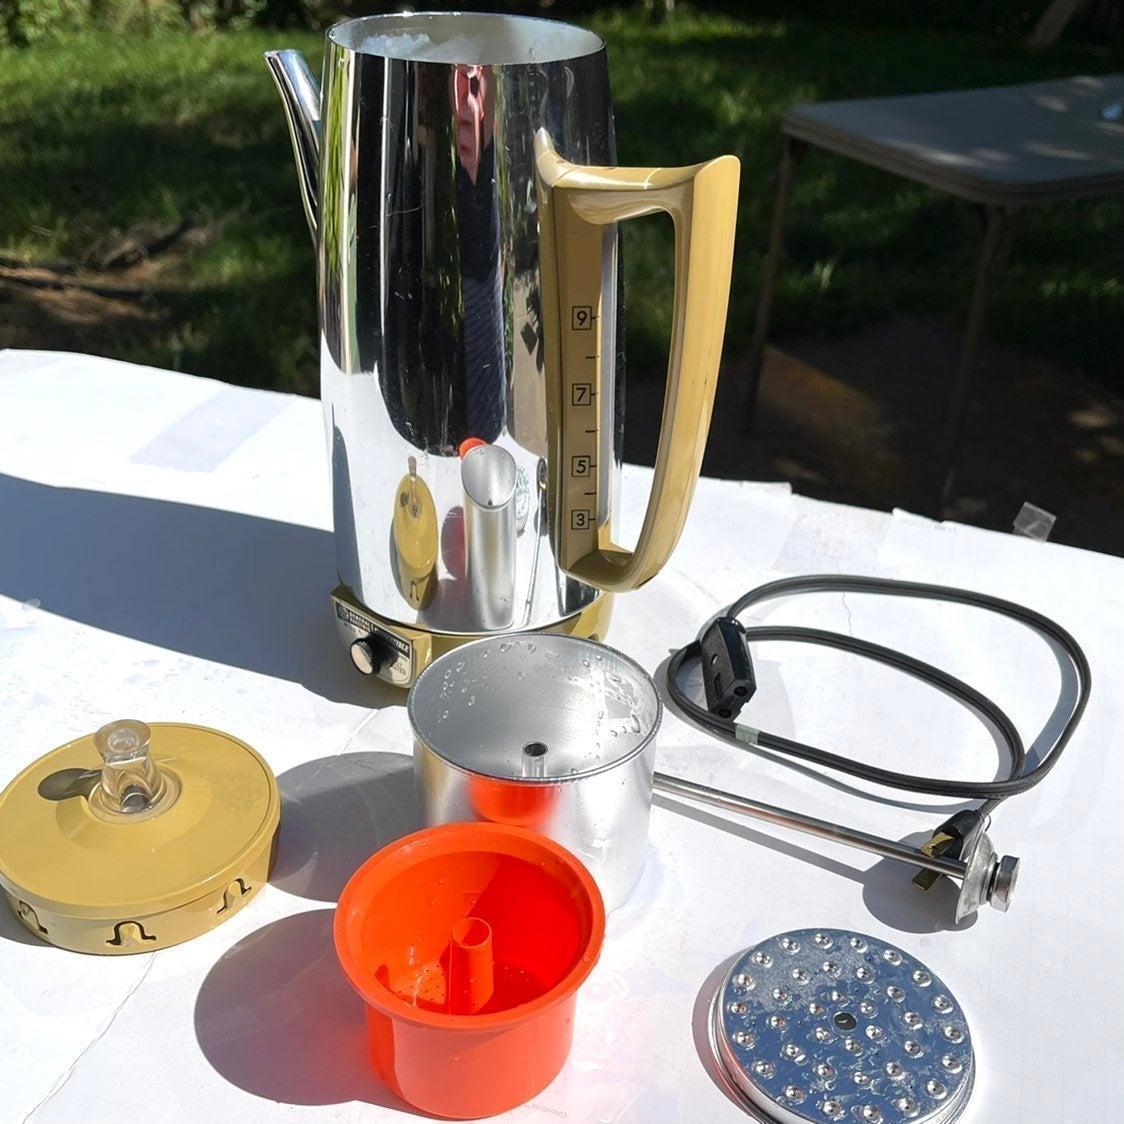 GE Electric Hot Water Percolator-vintage